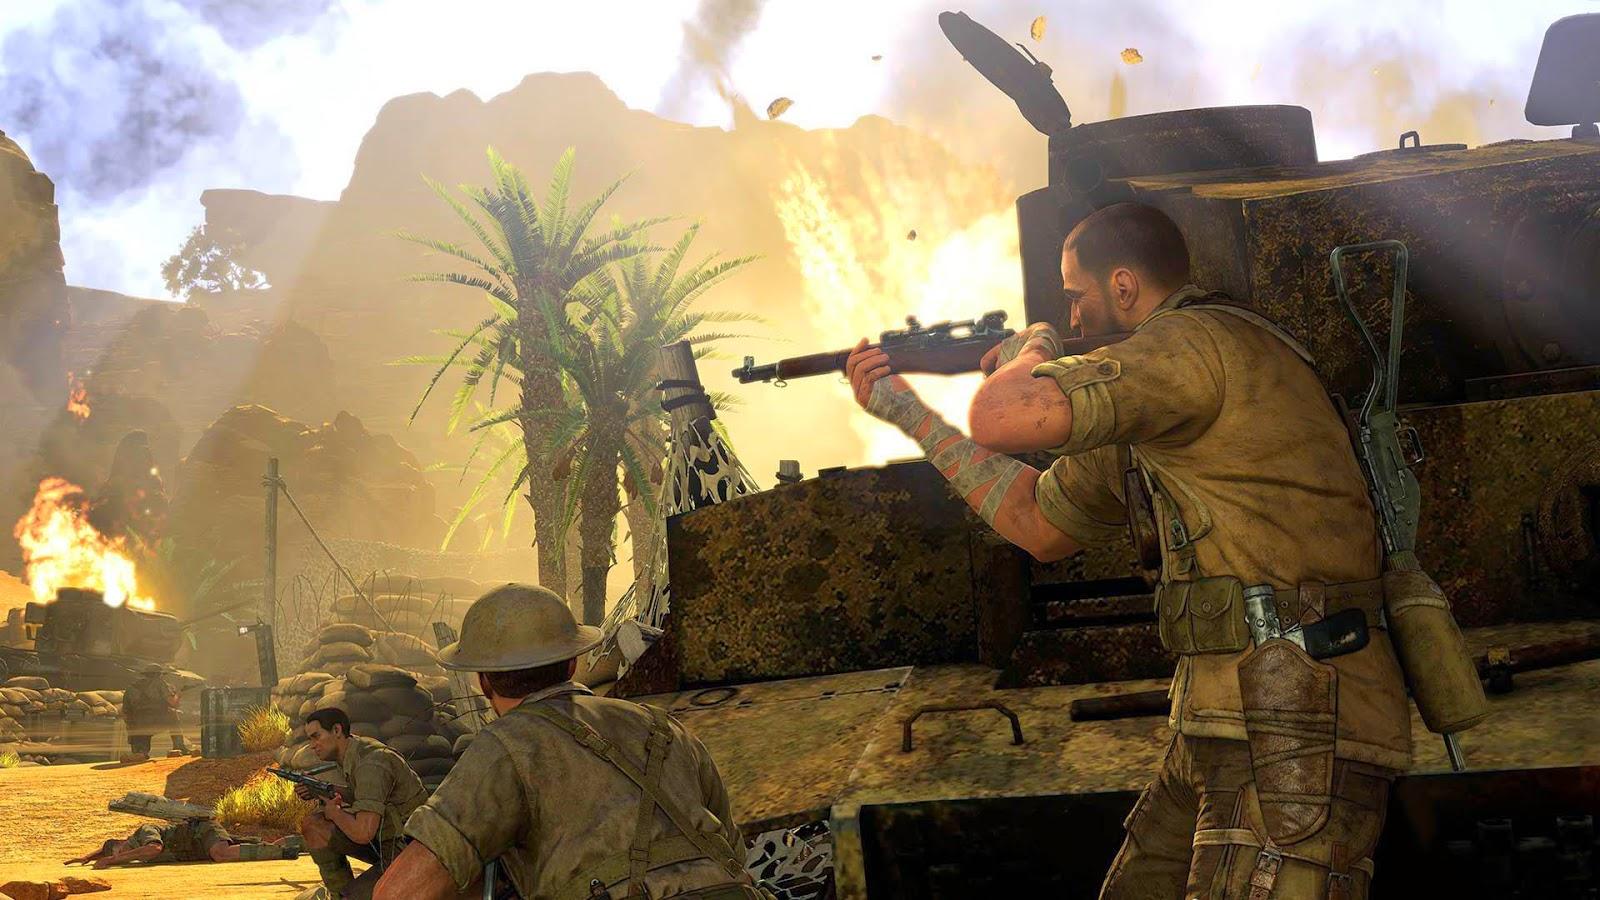 Sniper Elite 3 Wallpaper: HD Sniper Elite III Afrika 2014 Wallpapers